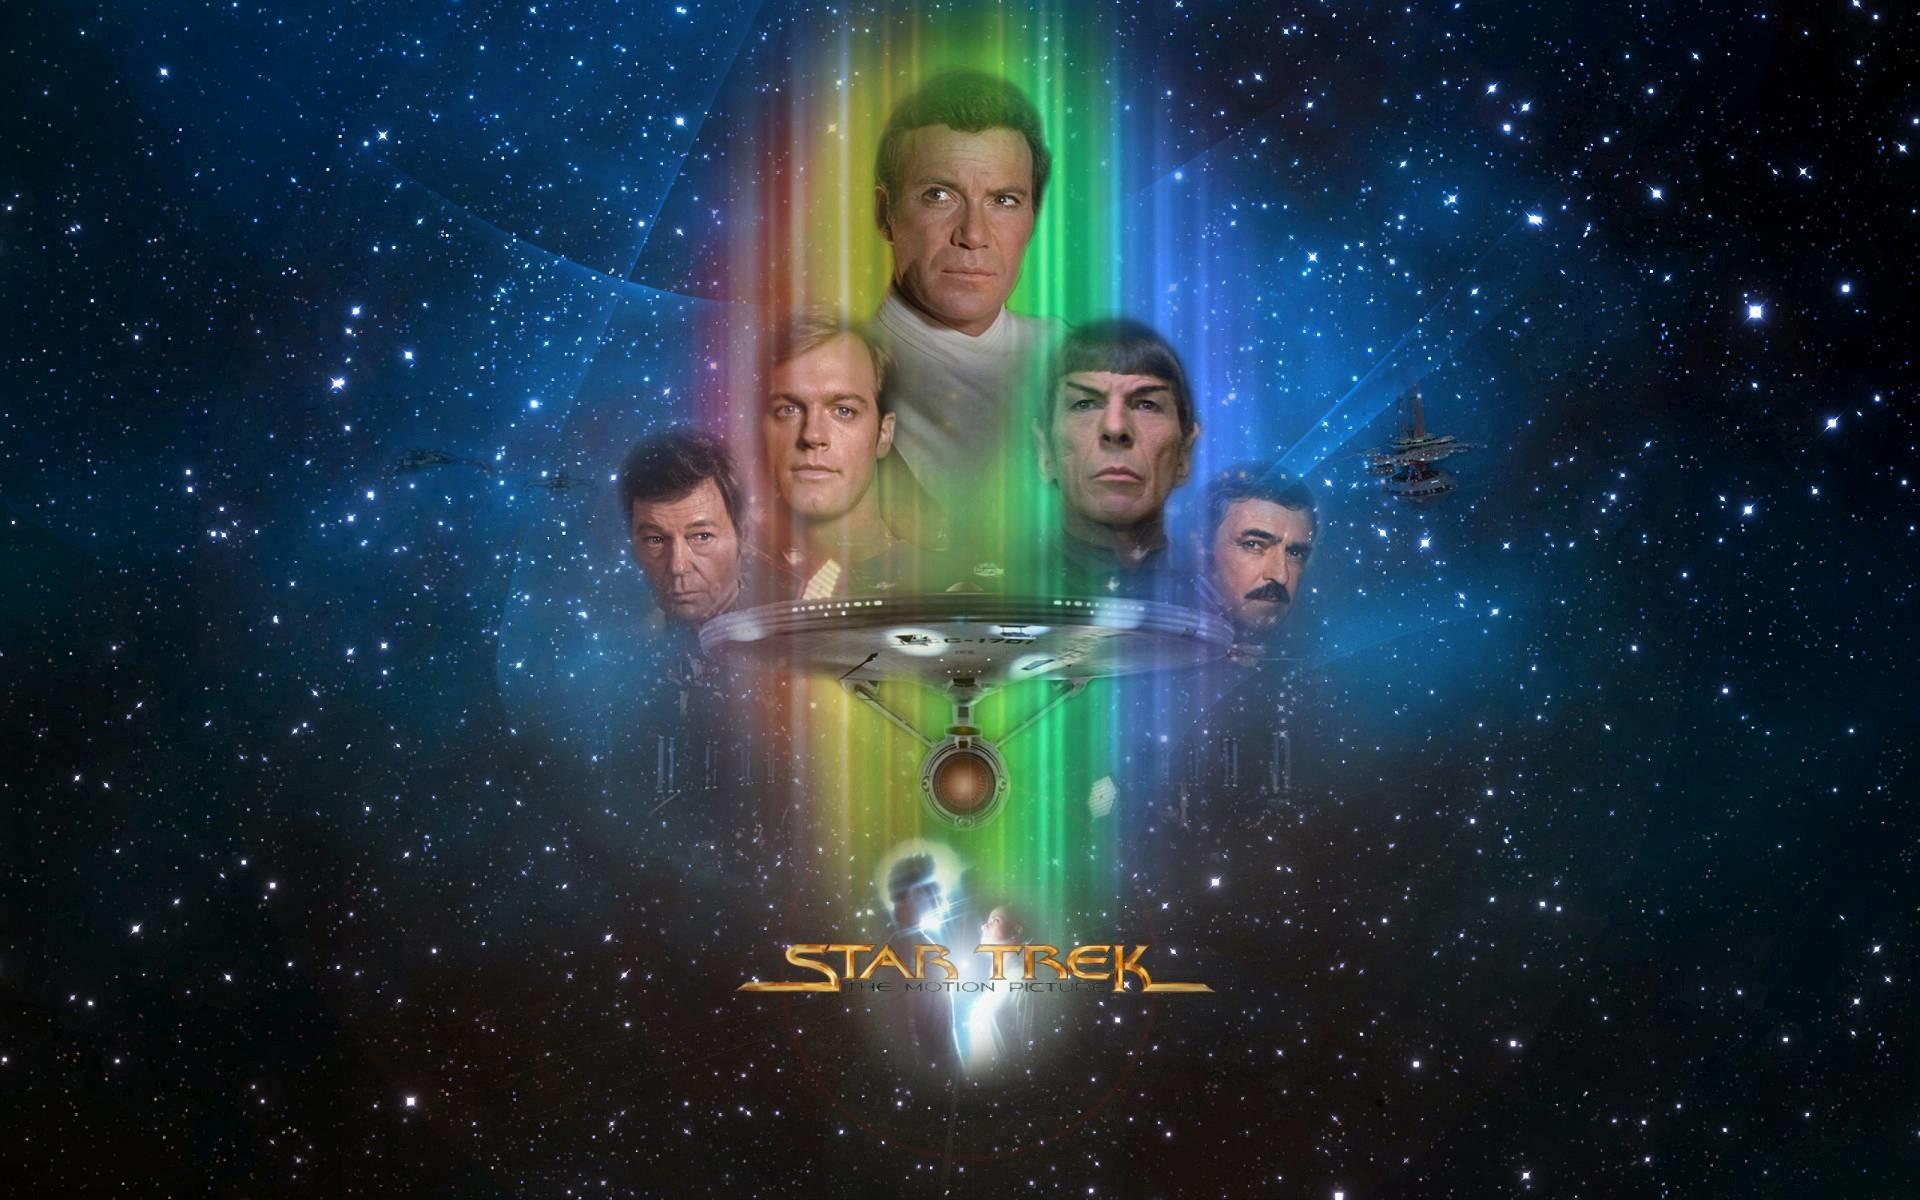 Star Trek Wallpaper Android 71 Images